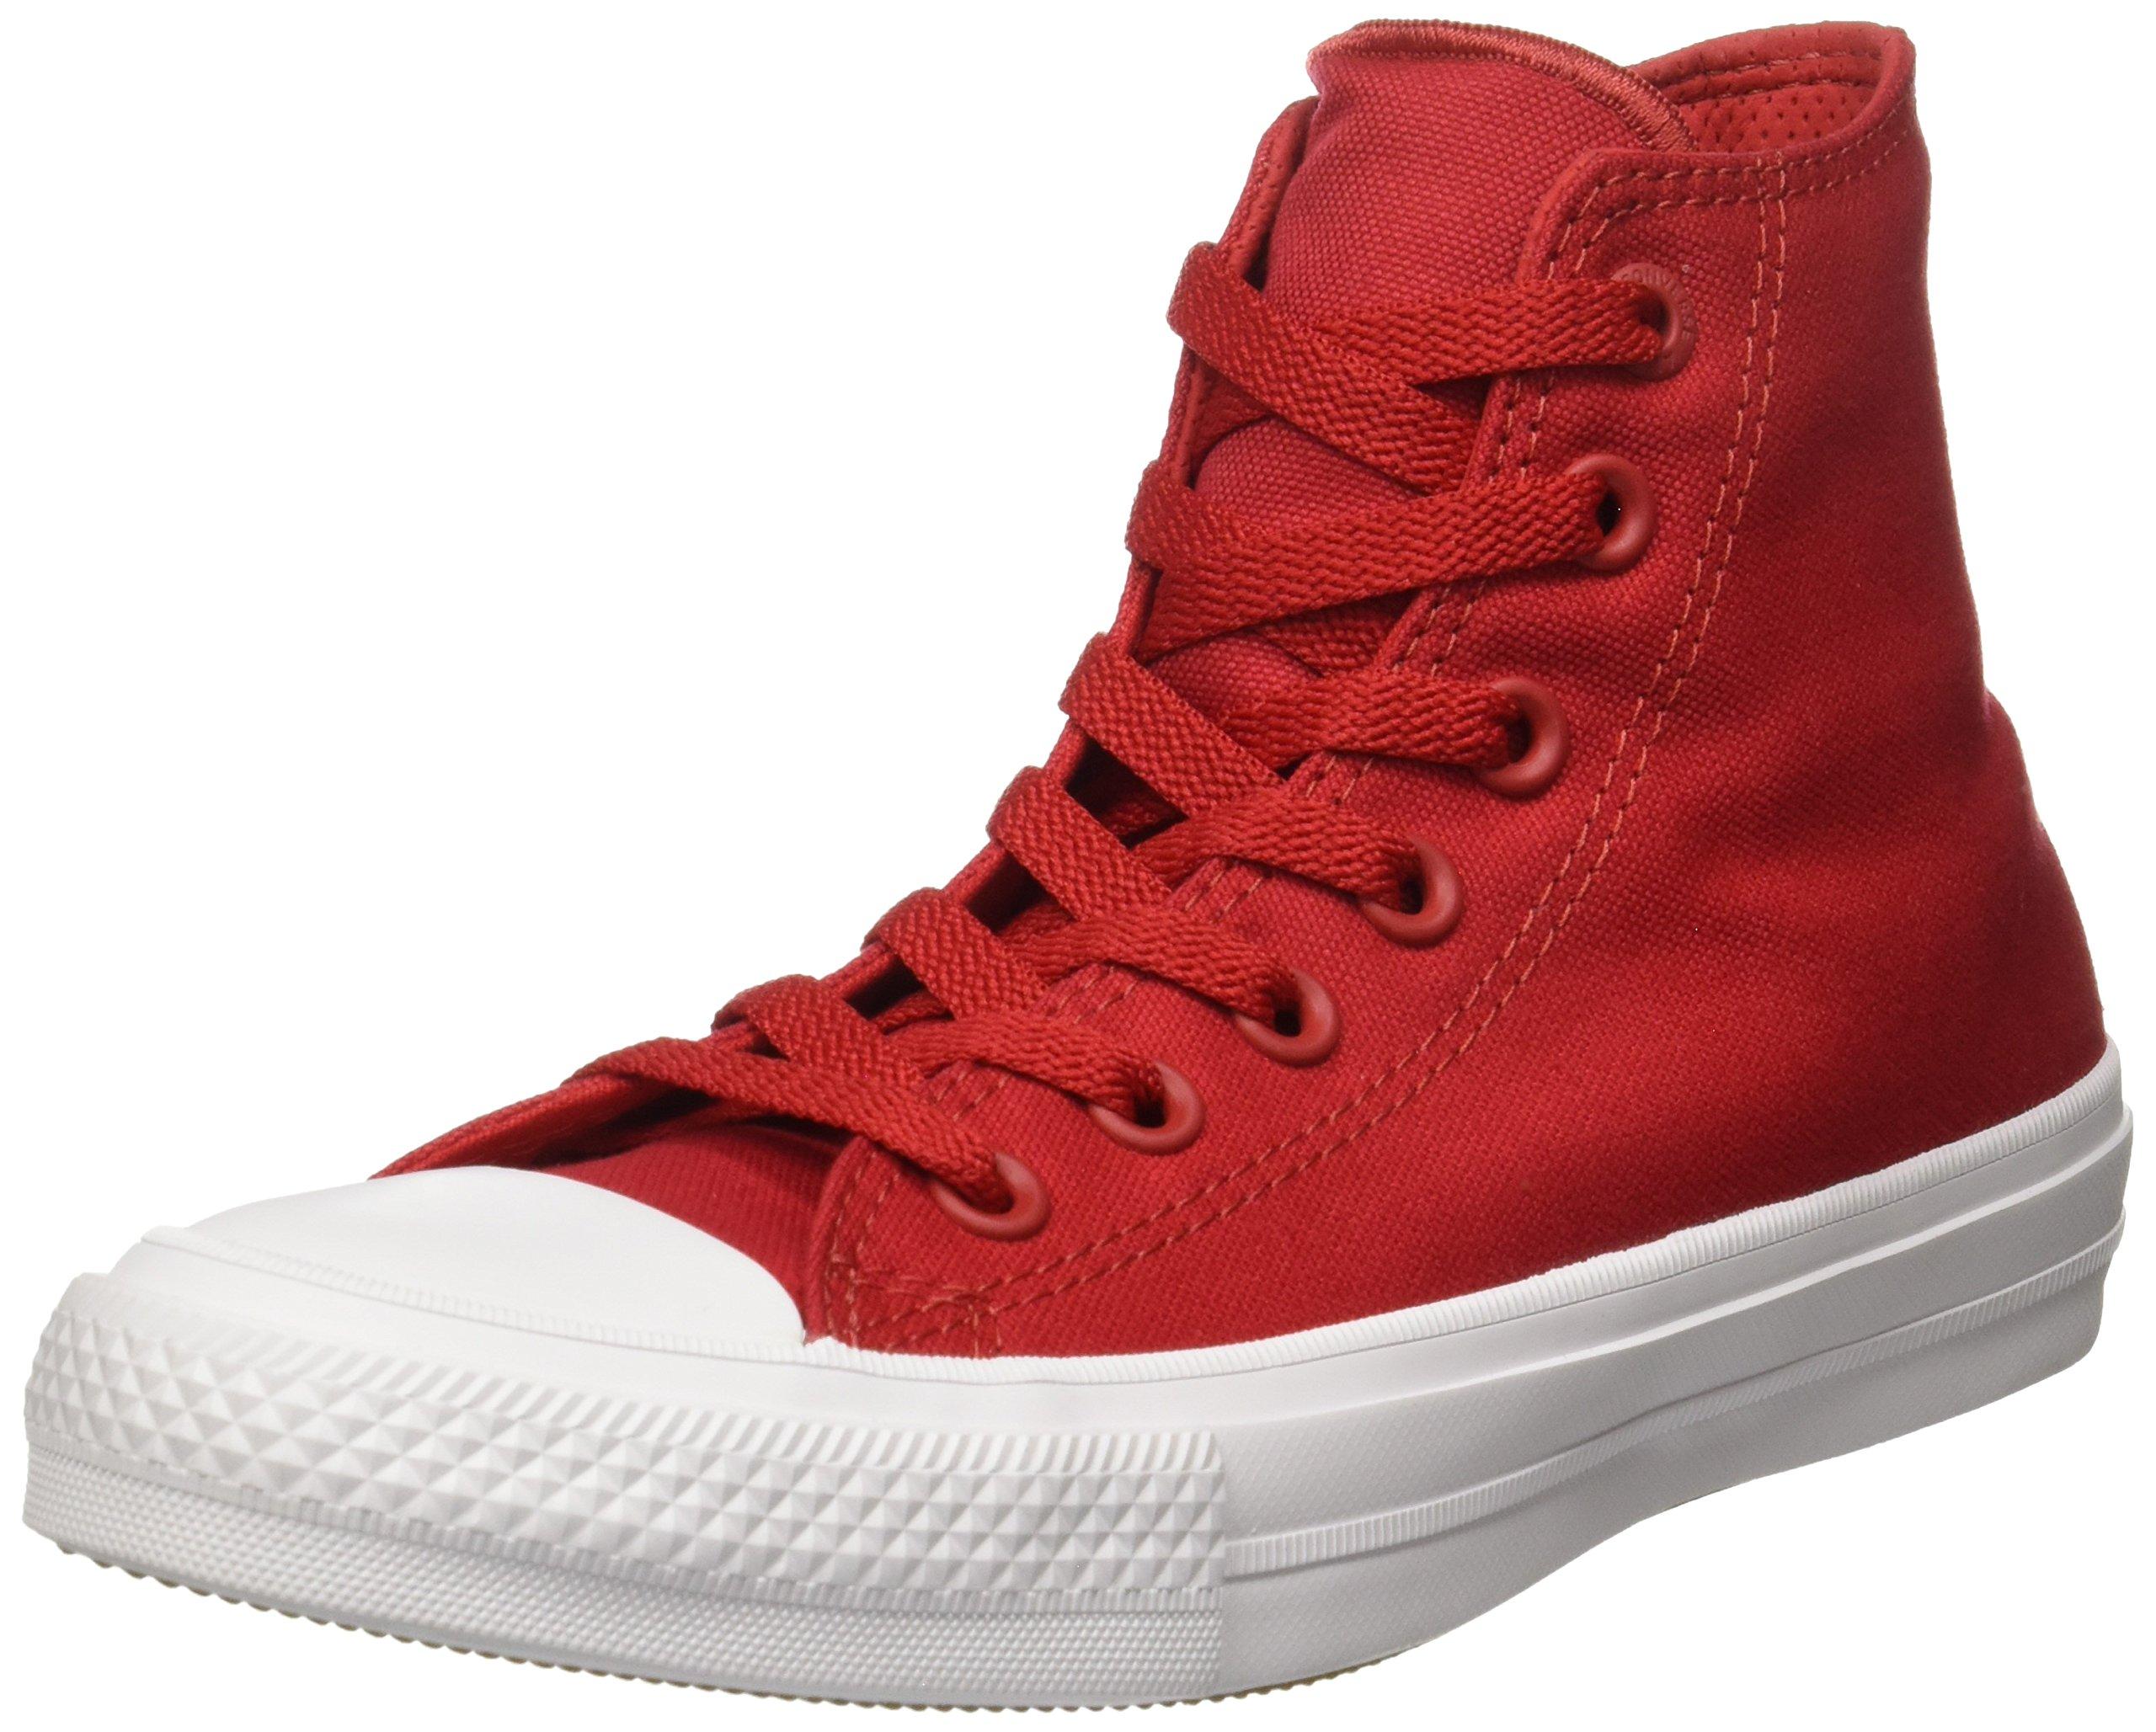 51b0072dc481 Galleon - Converse Unisex Chuck Taylor All Star II Hi Salsa Red White Navy  Sneaker